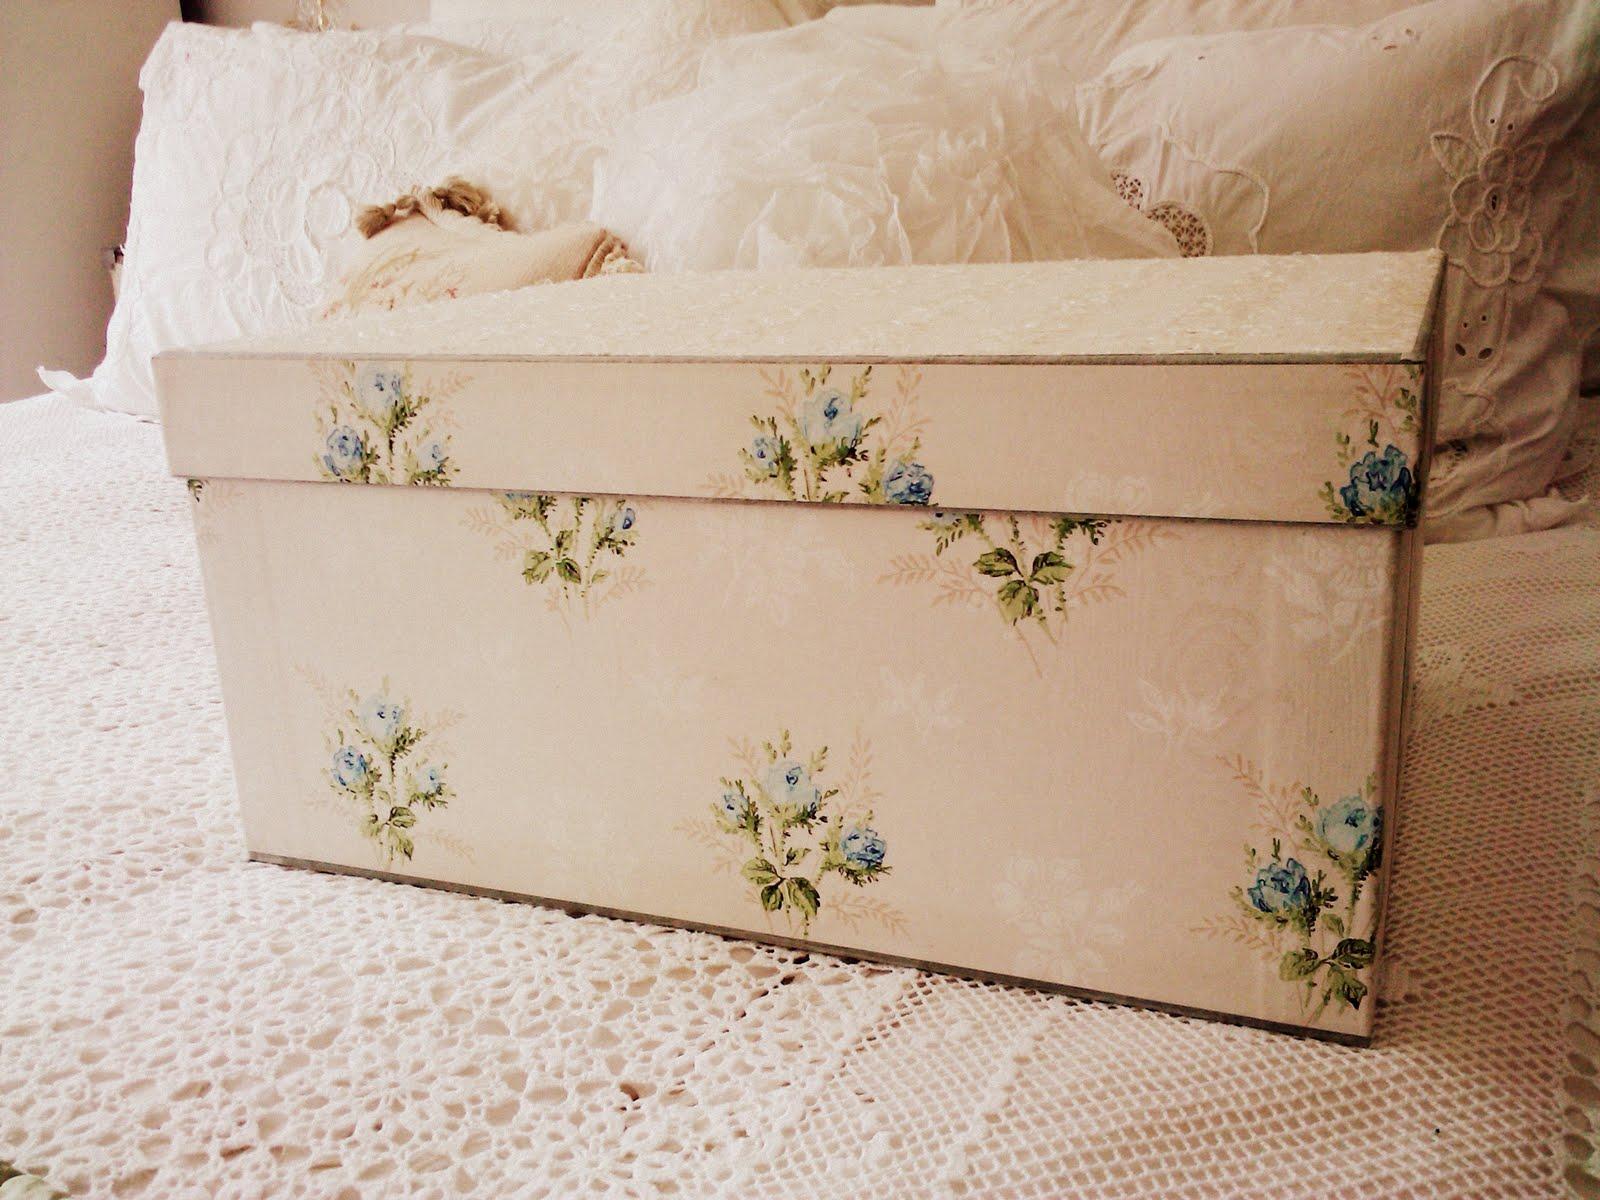 http://2.bp.blogspot.com/-sd6sx44CWXQ/TeTFNFJwKGI/AAAAAAAABWw/PZ7NndnmKdU/s1600/vintage+boxes+%2526+house+218.1.jpg